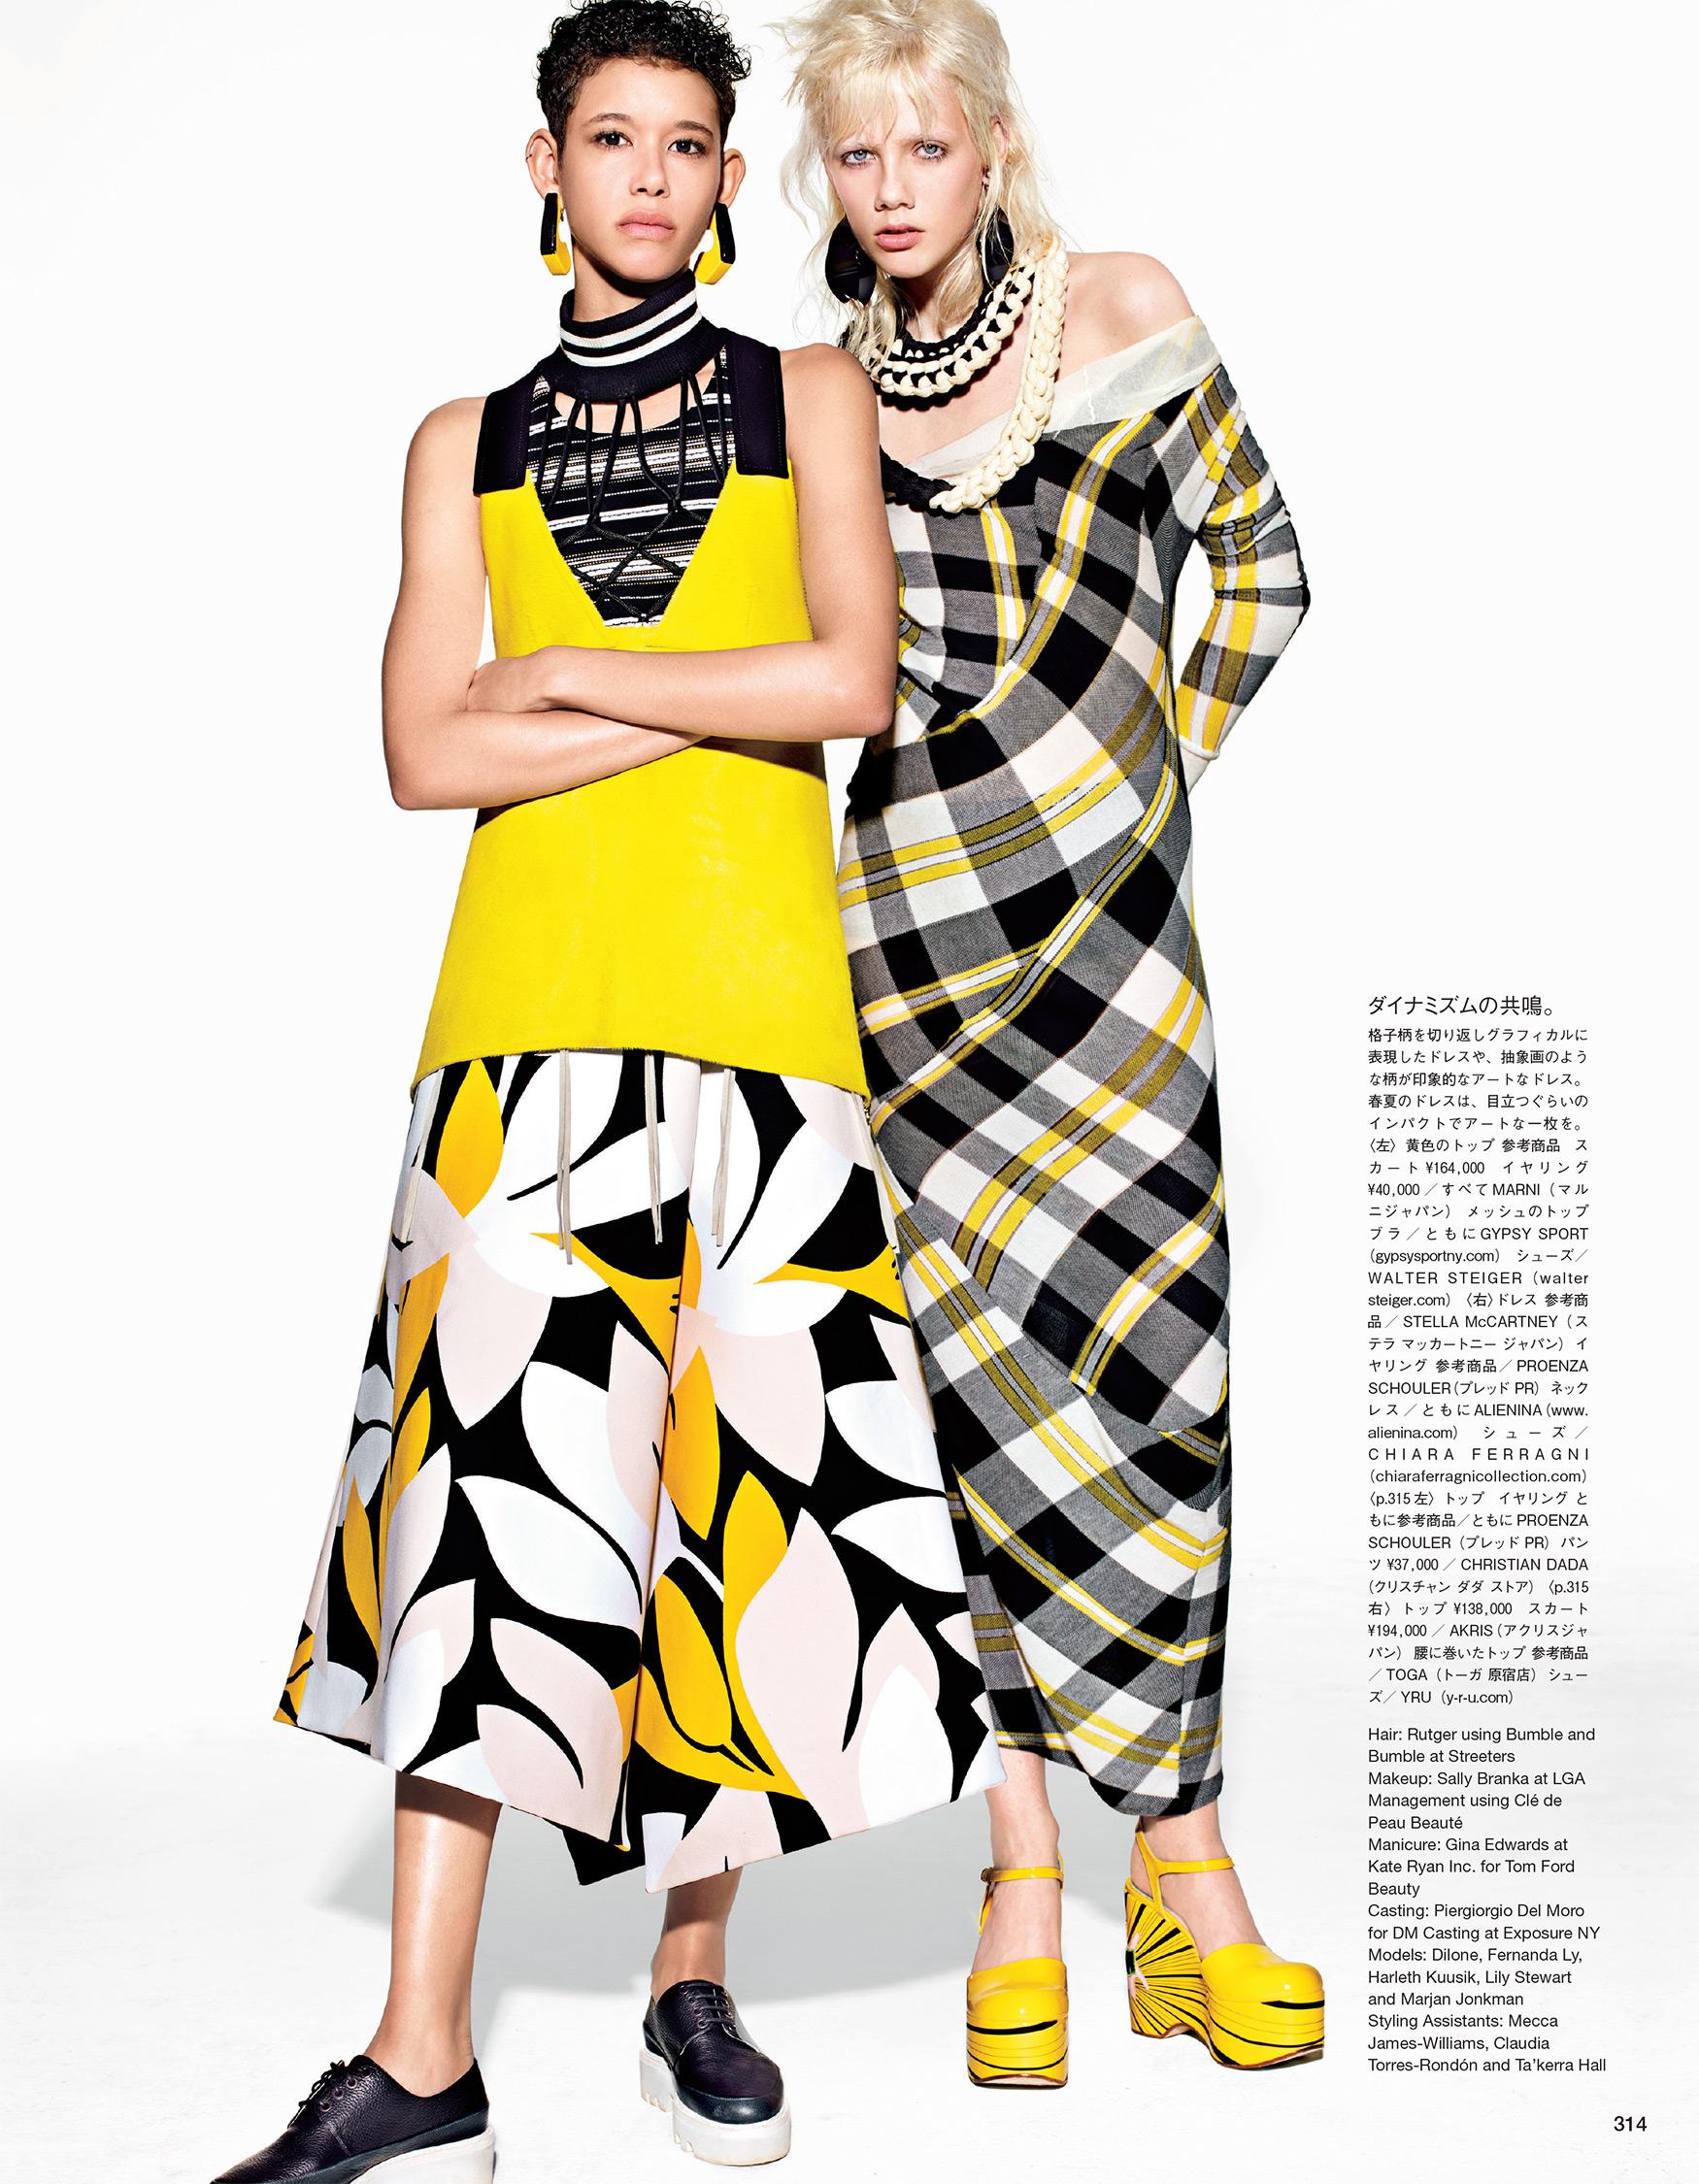 Giovanna-Battaglia-Vogue-Japan-The-Geek-Girls-Society-Richard-Brubridge-8.jpg